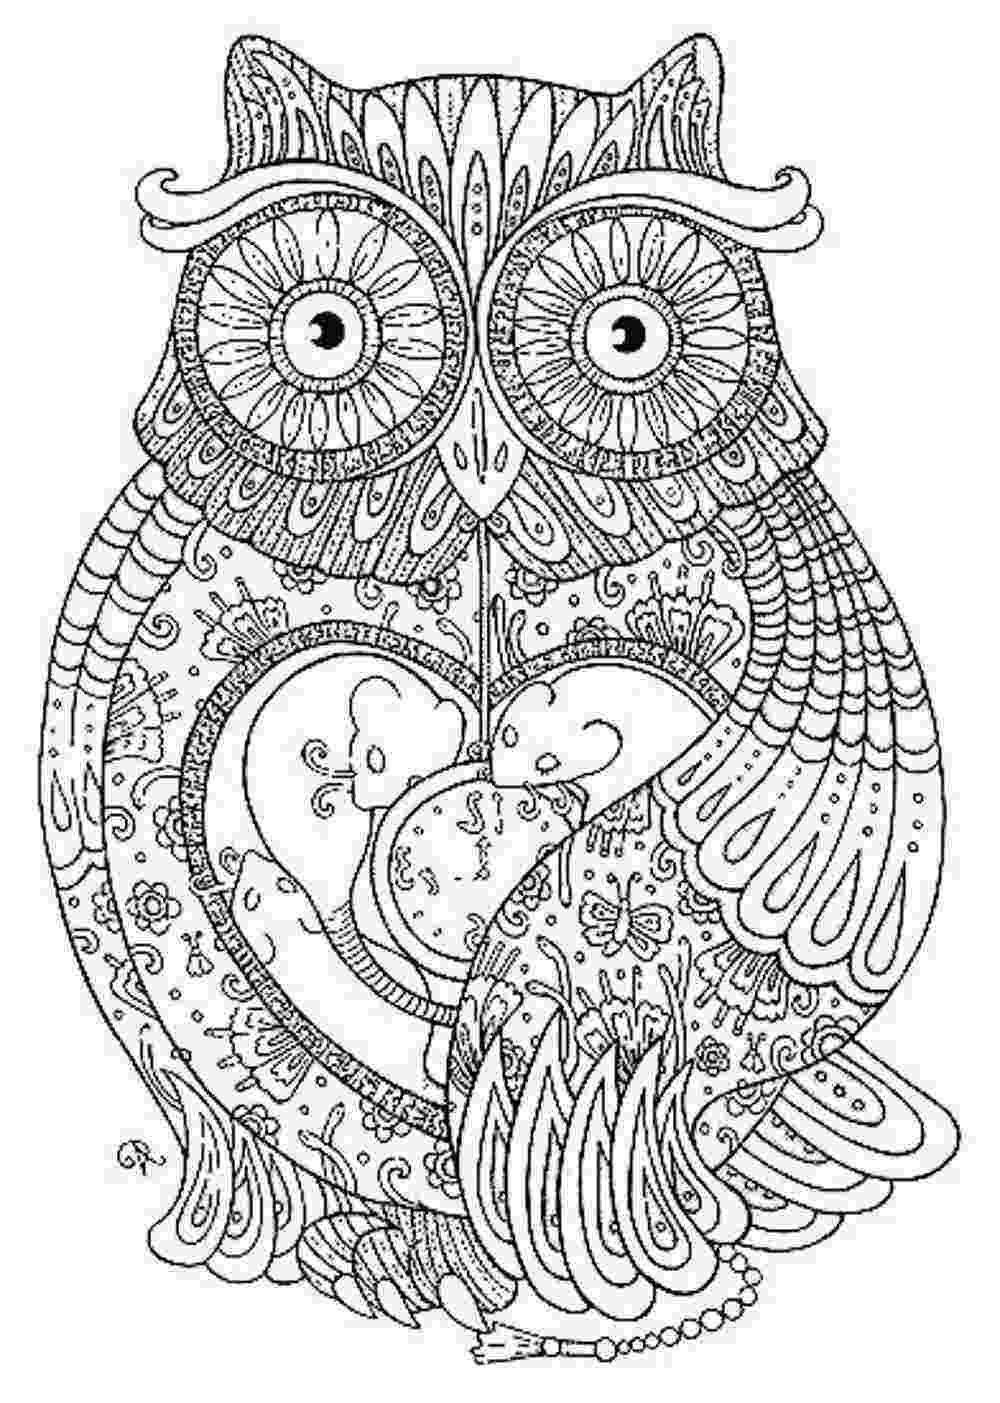 free printable mandala coloring sheets mindful mandalas juste etre just be free sheets mandala printable coloring